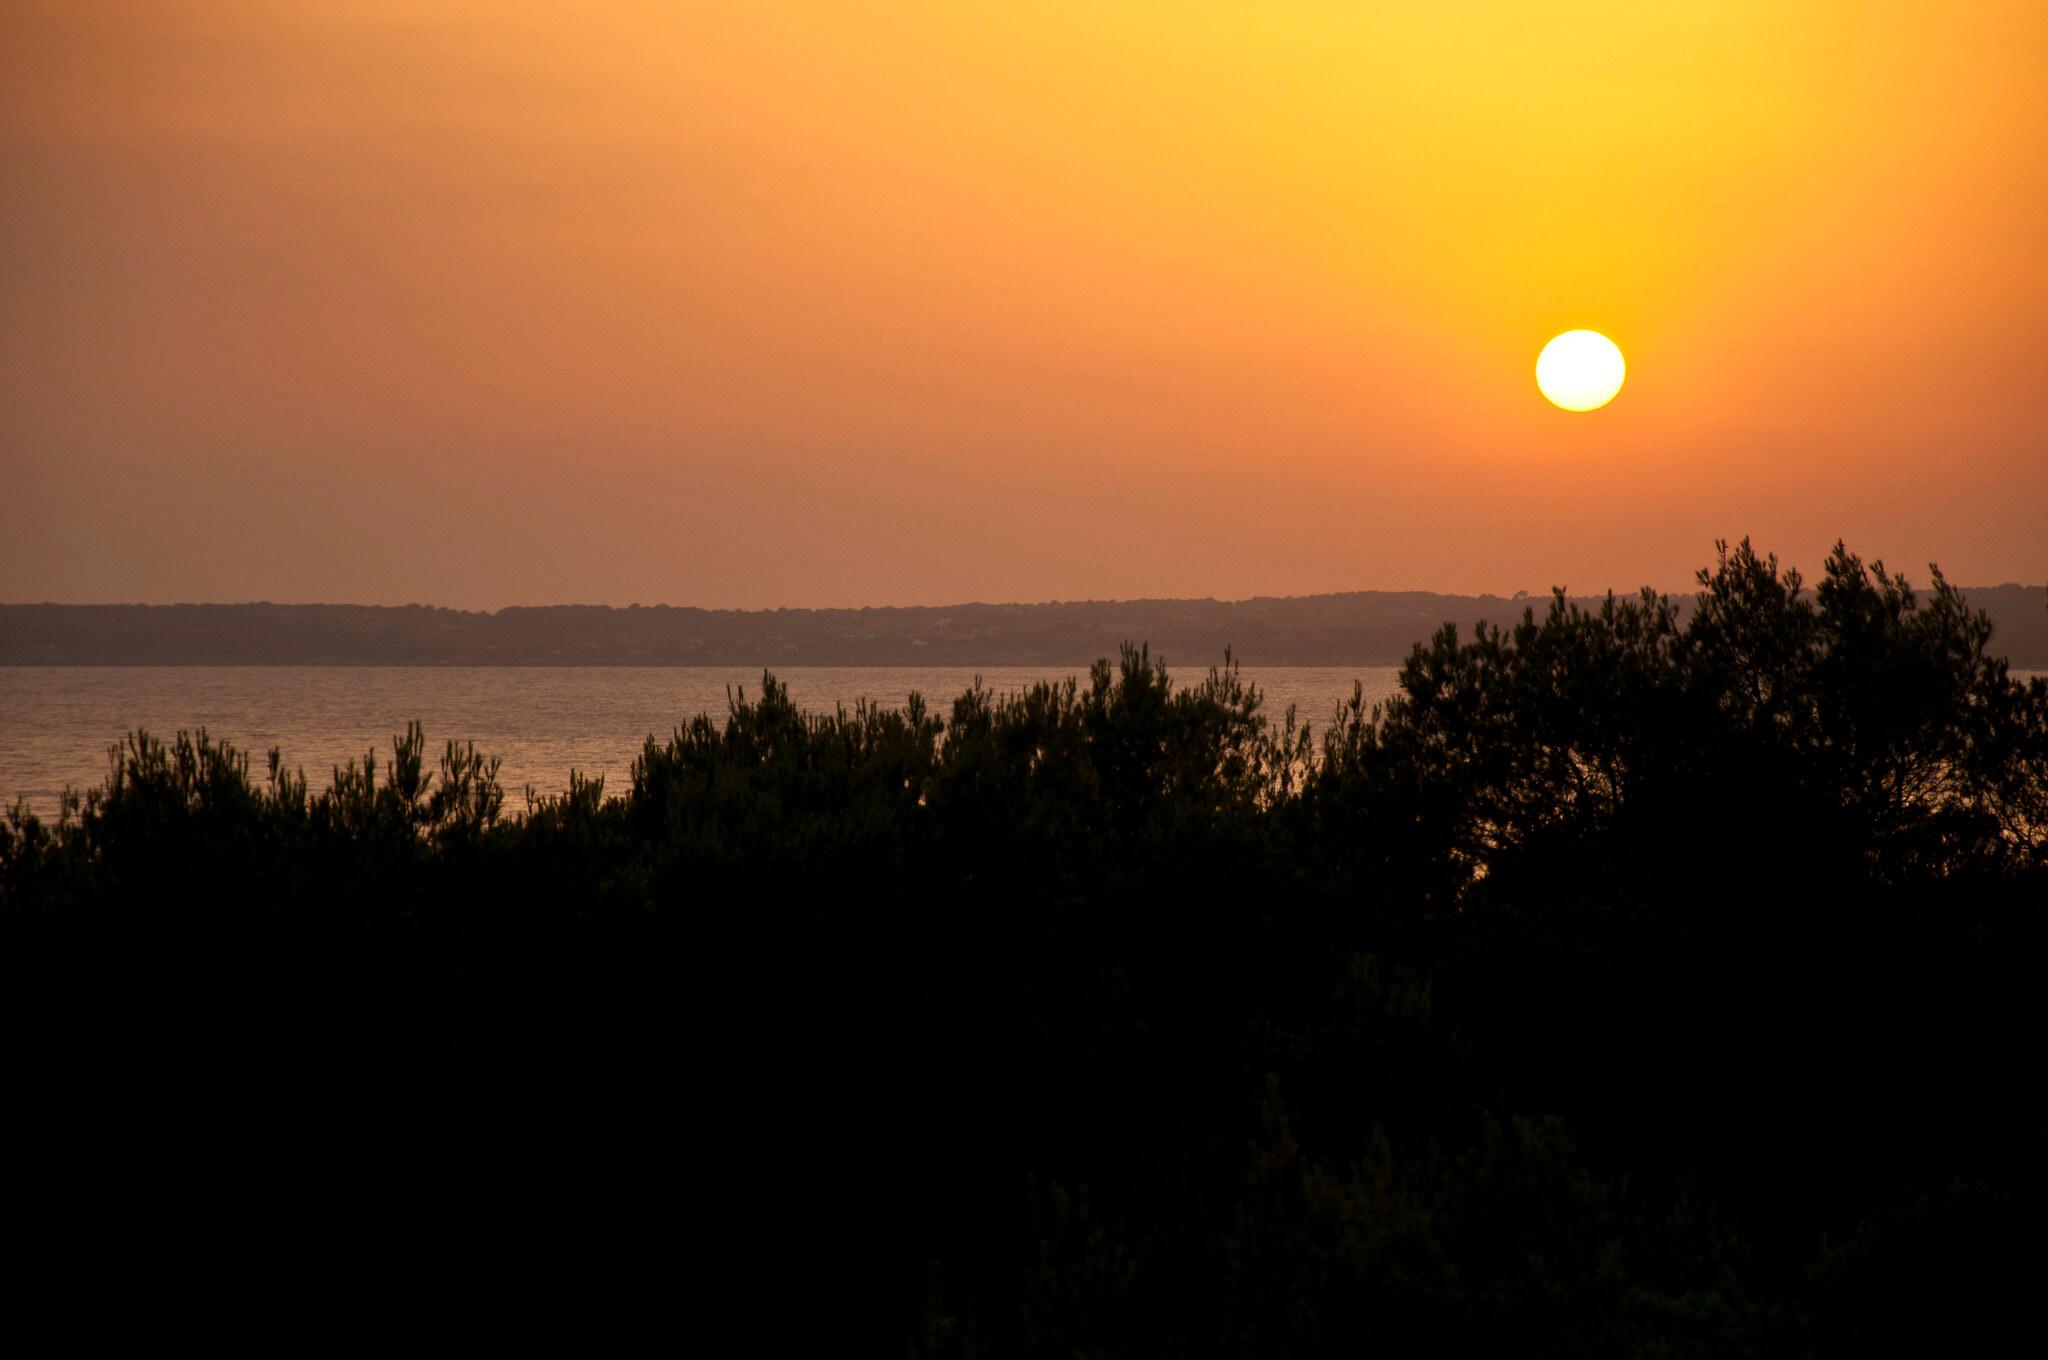 https://www.white-ibiza.com/wp-content/uploads/2020/03/formentera-sunsets-2020-09.jpg